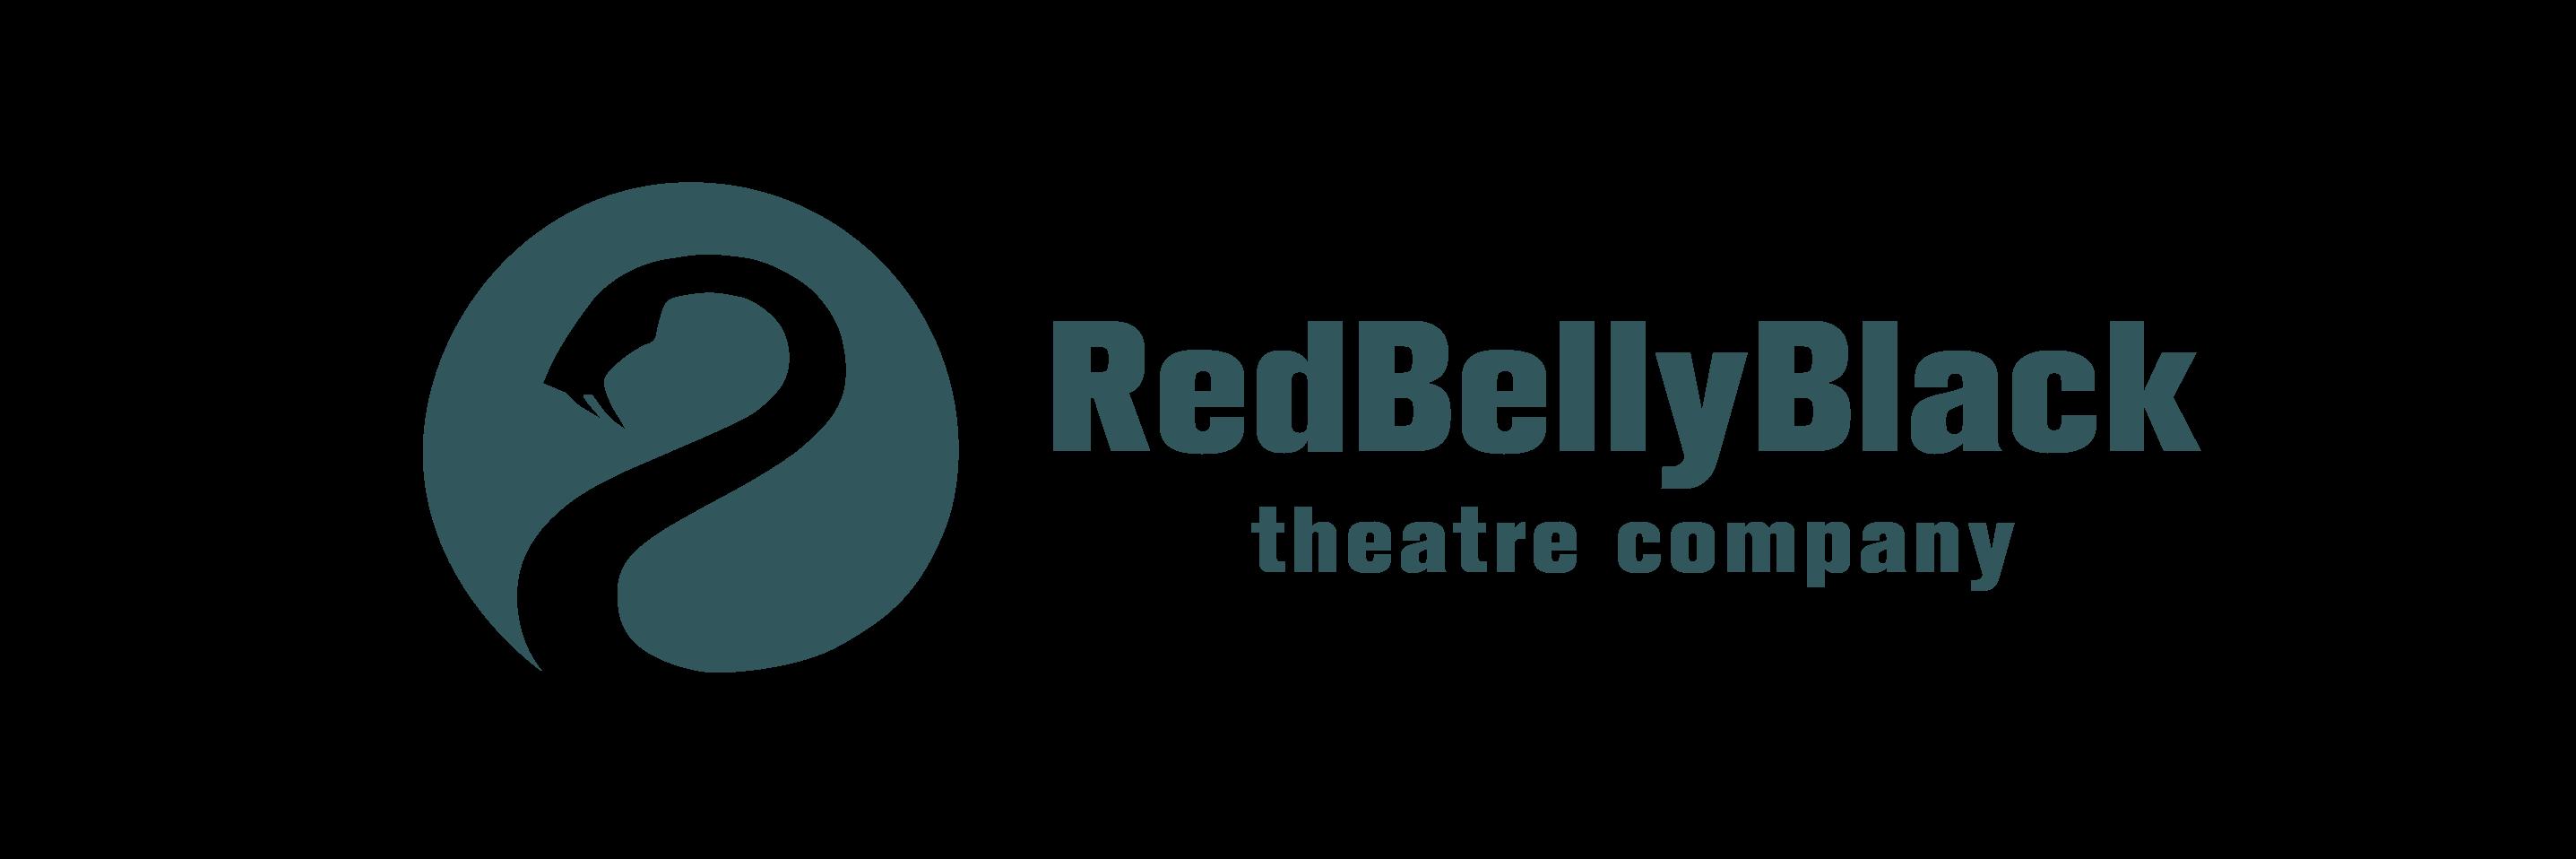 RedBellyBlack